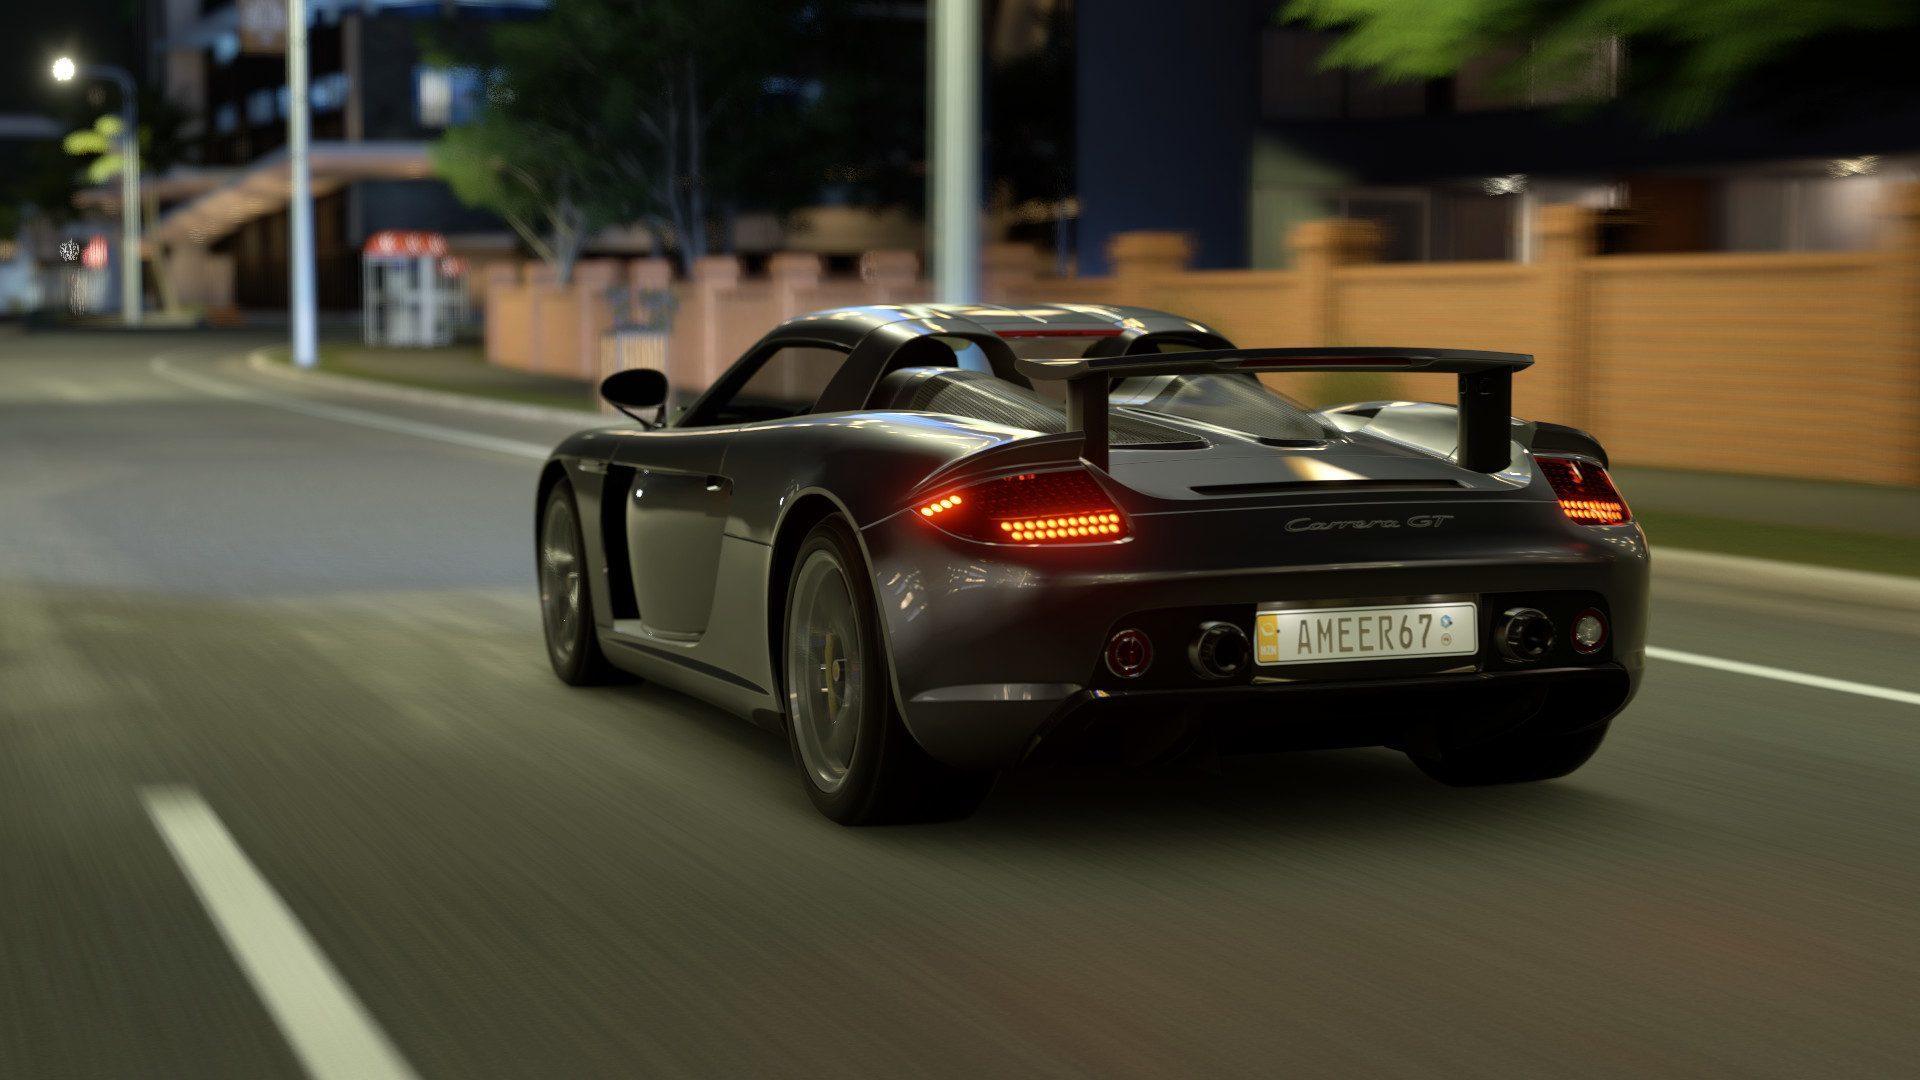 Pick Up The Porsche Carrera Gt In This Weekend S Forzathon